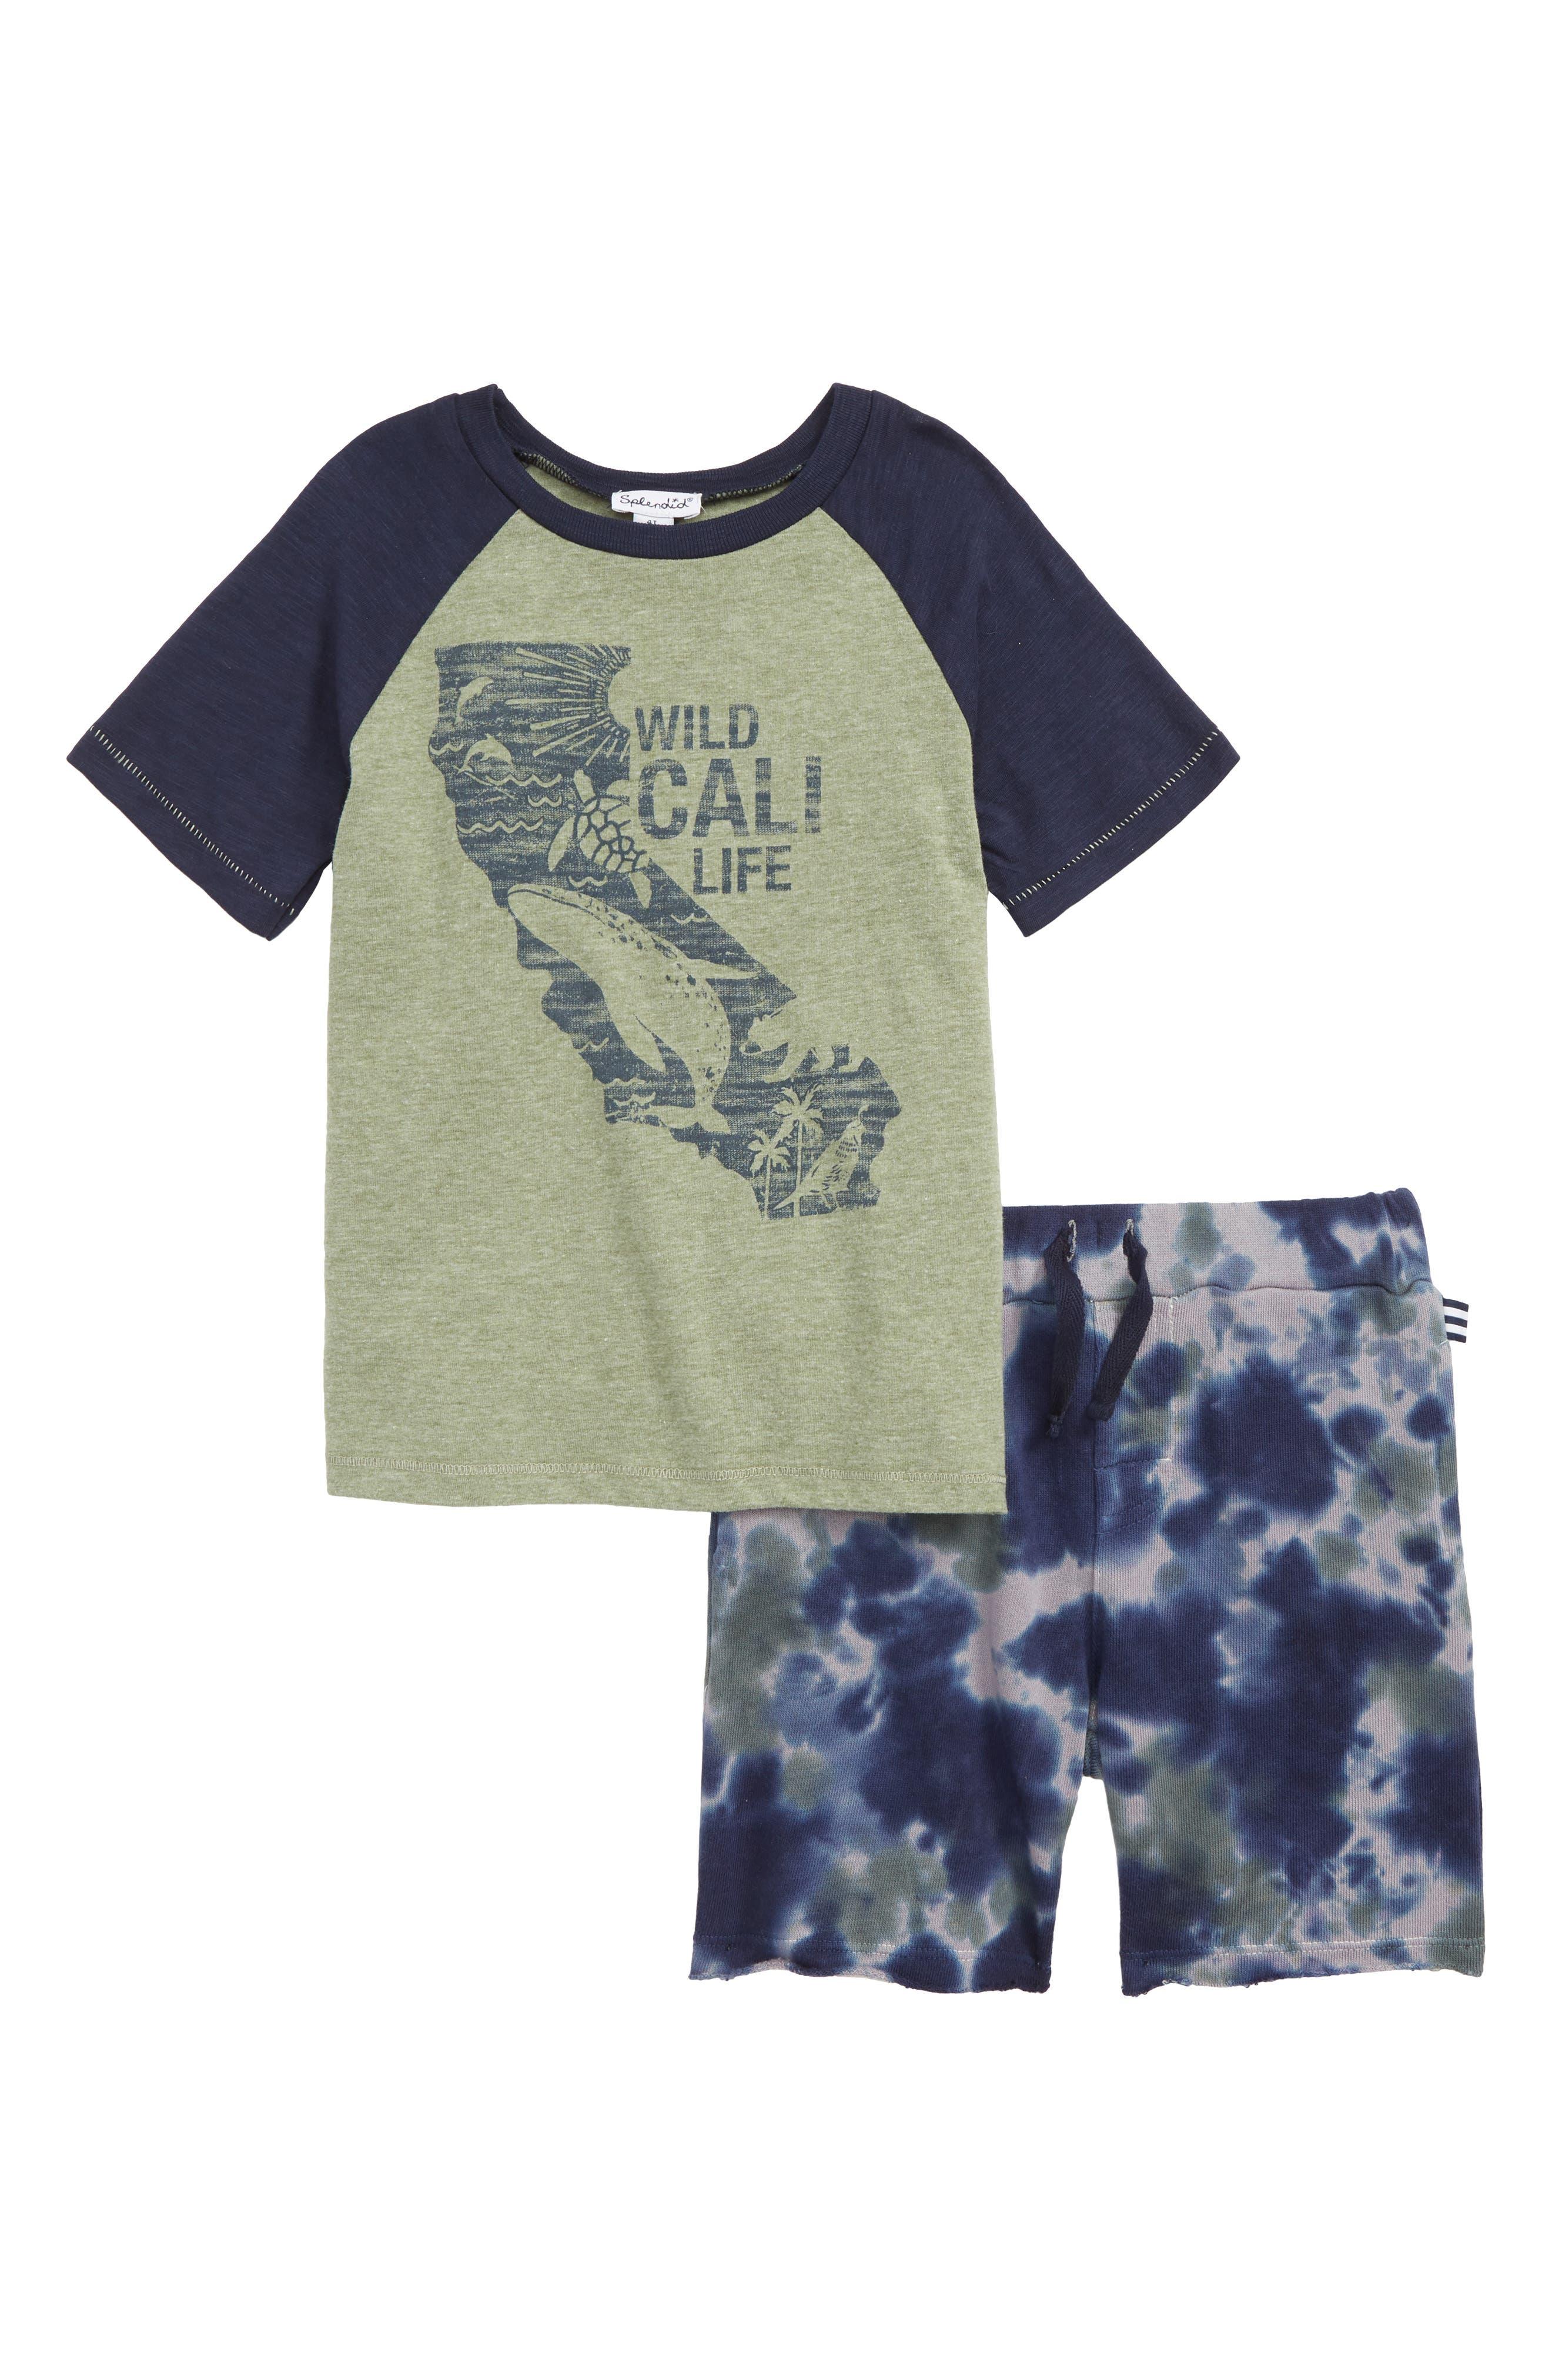 Boys Splendid Wild Cali Life TShirt  Shorts Set